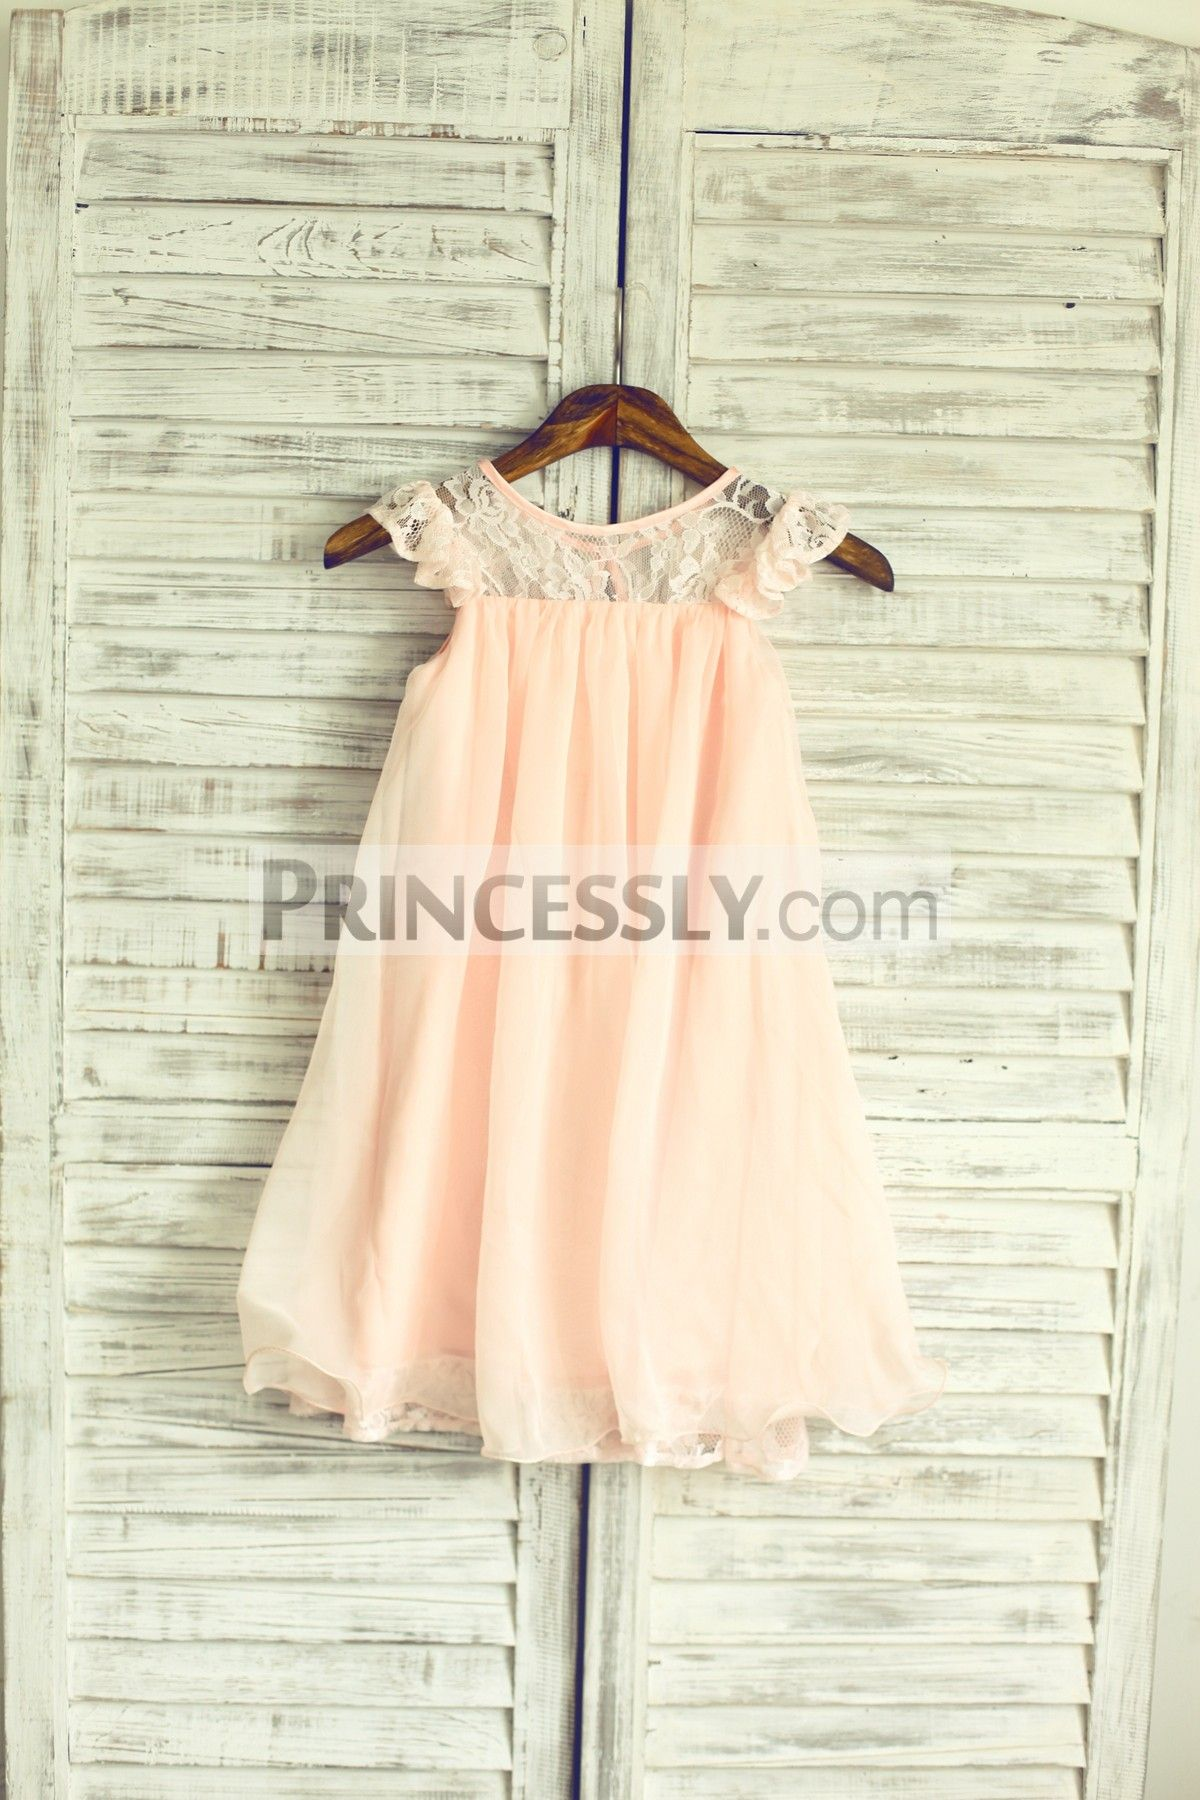 Navy Blueivoryblush Pinkgrey Lace Chiffon Flower Girl Dress With